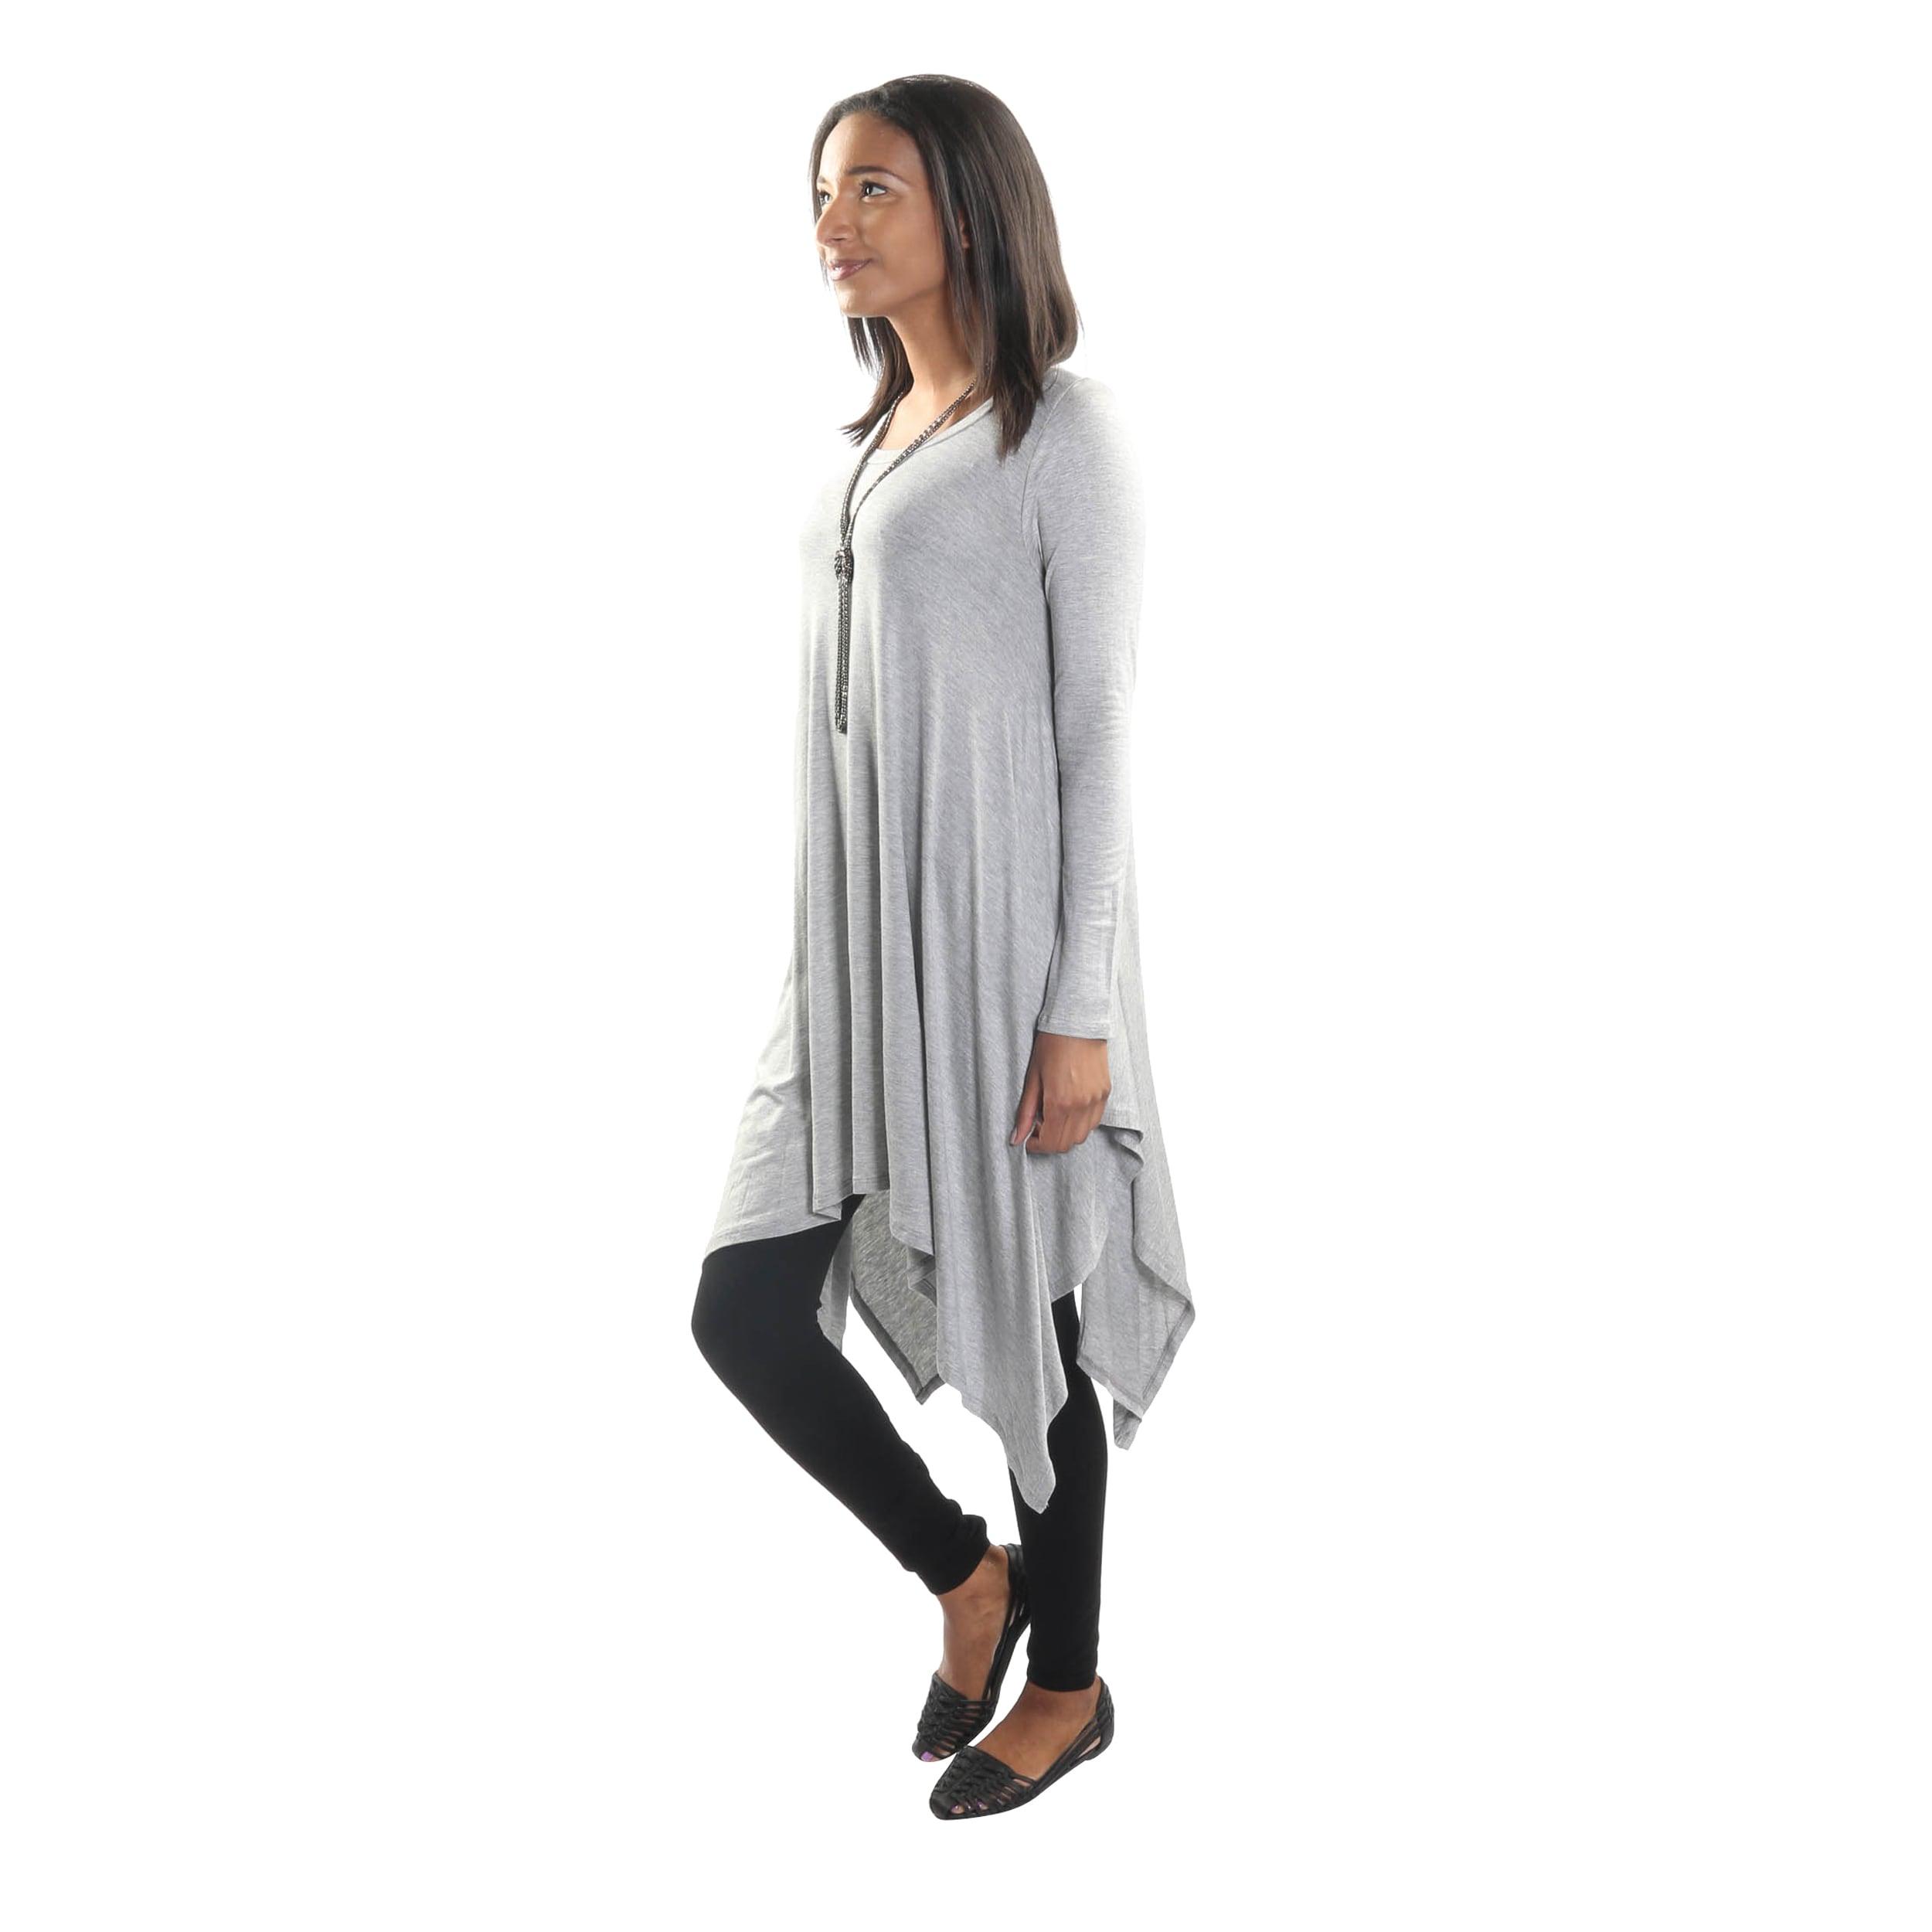 3213f8f92c90 Shop Hadari Women's Long Sleeve Round Neck Dress - Free Shipping On ...